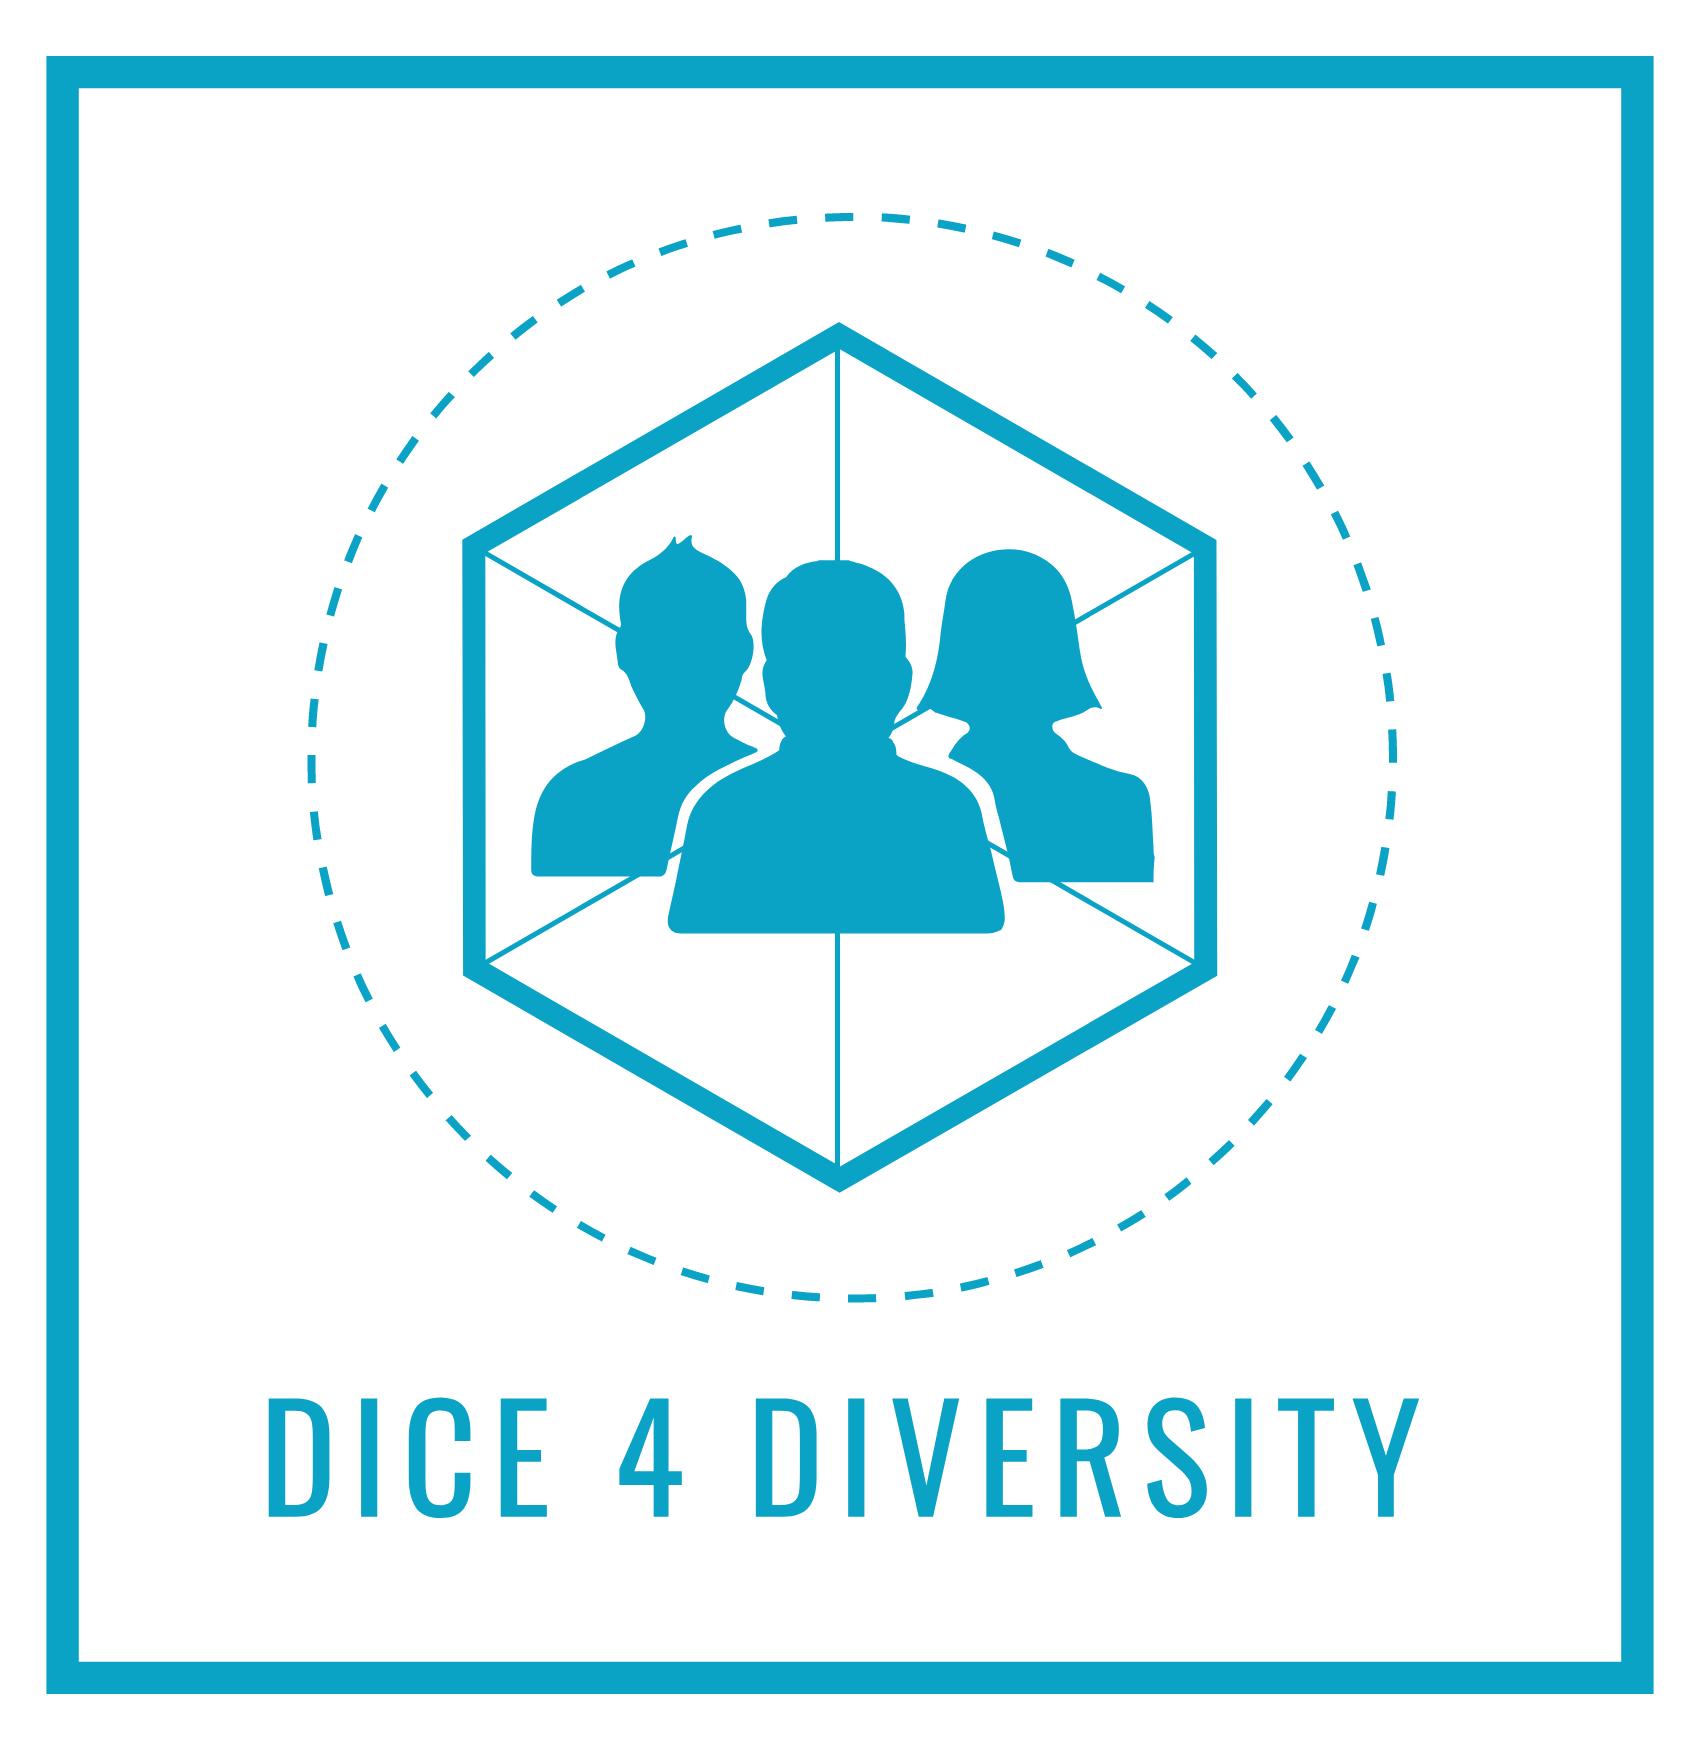 DICE 4 DIVERSITY GAMING